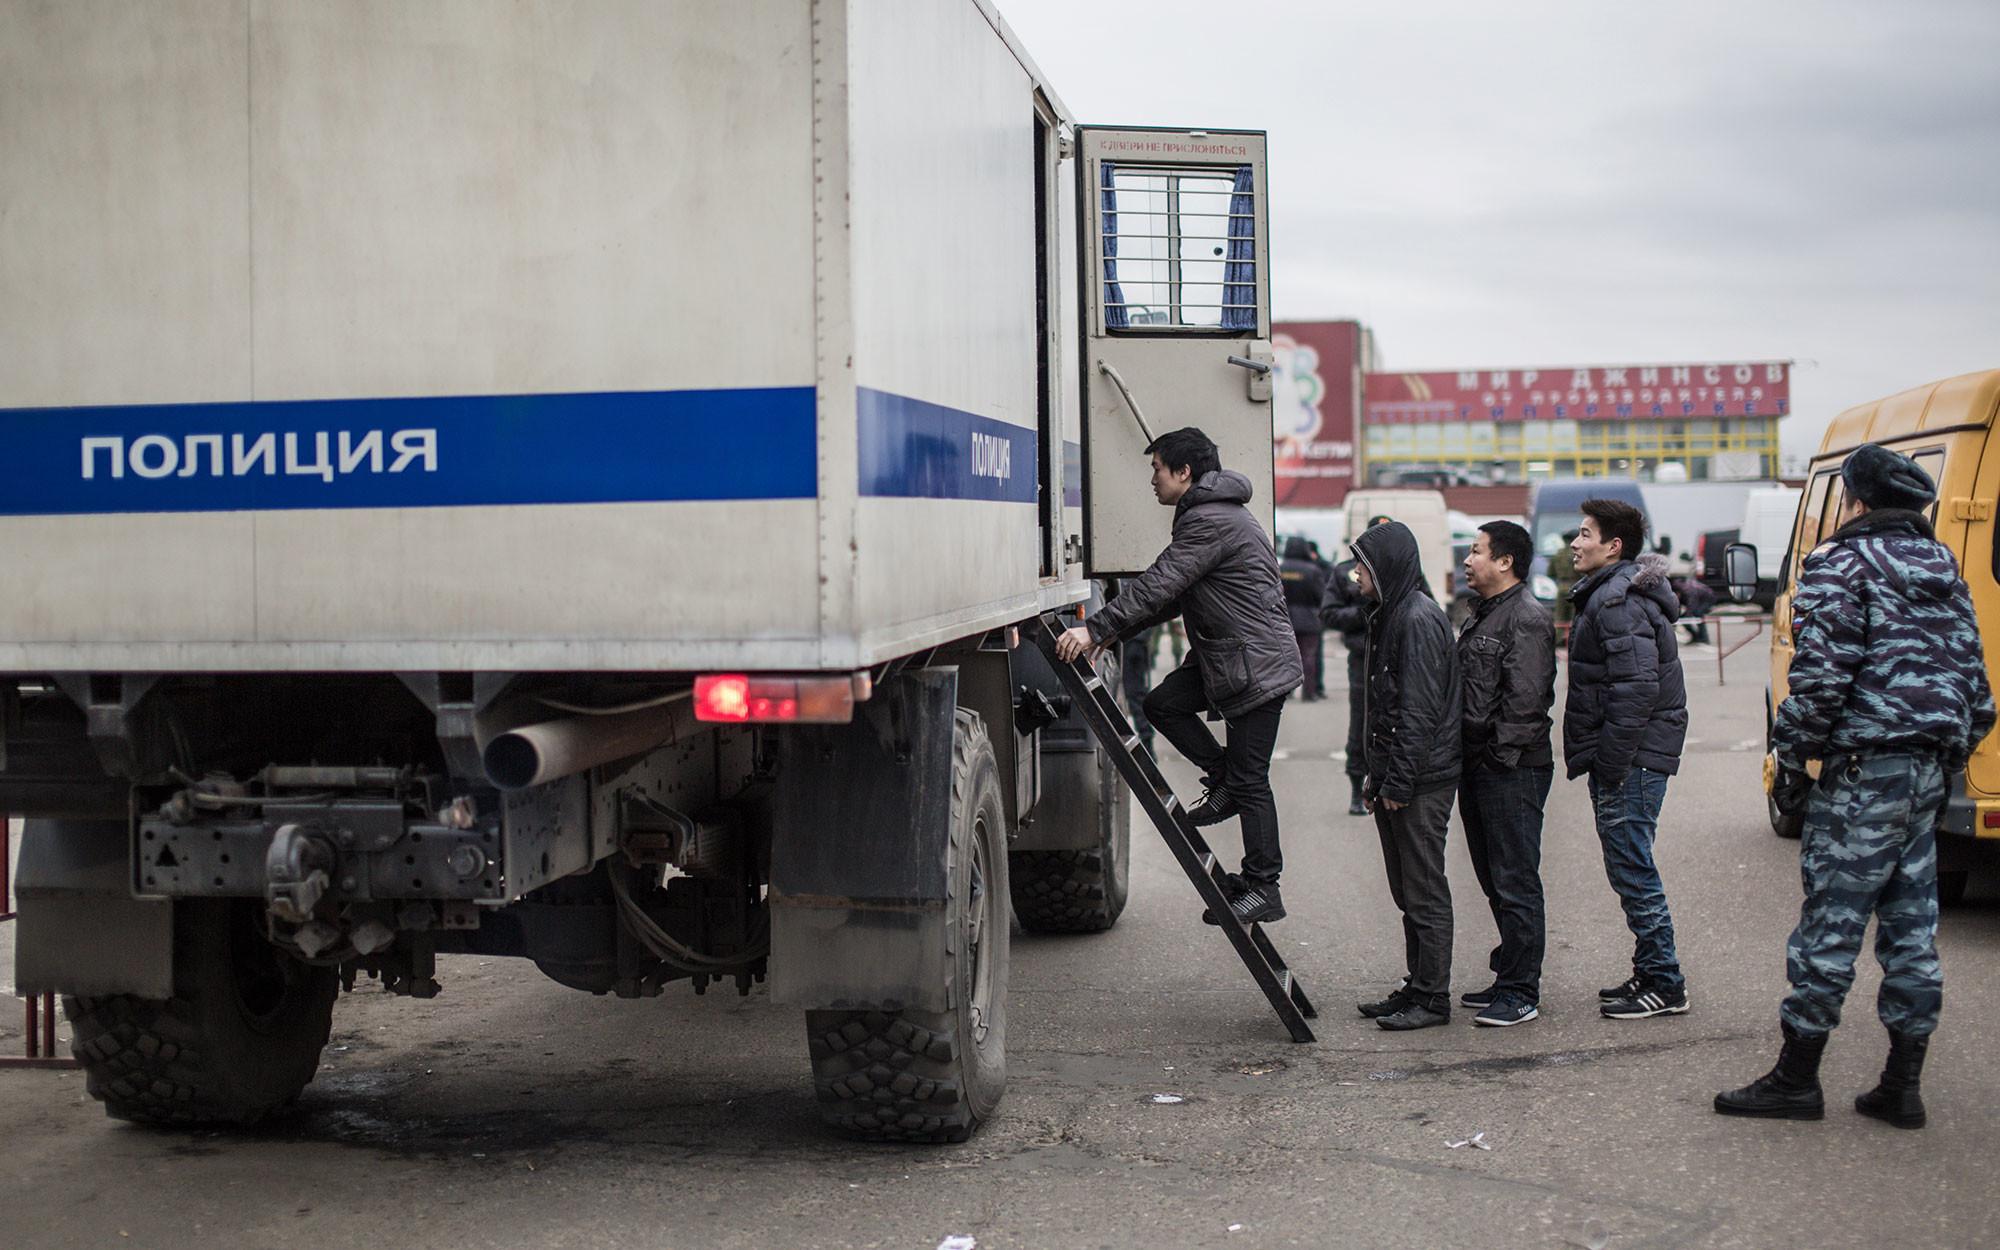 Фото: © РИА Новости / Андрей Стенин